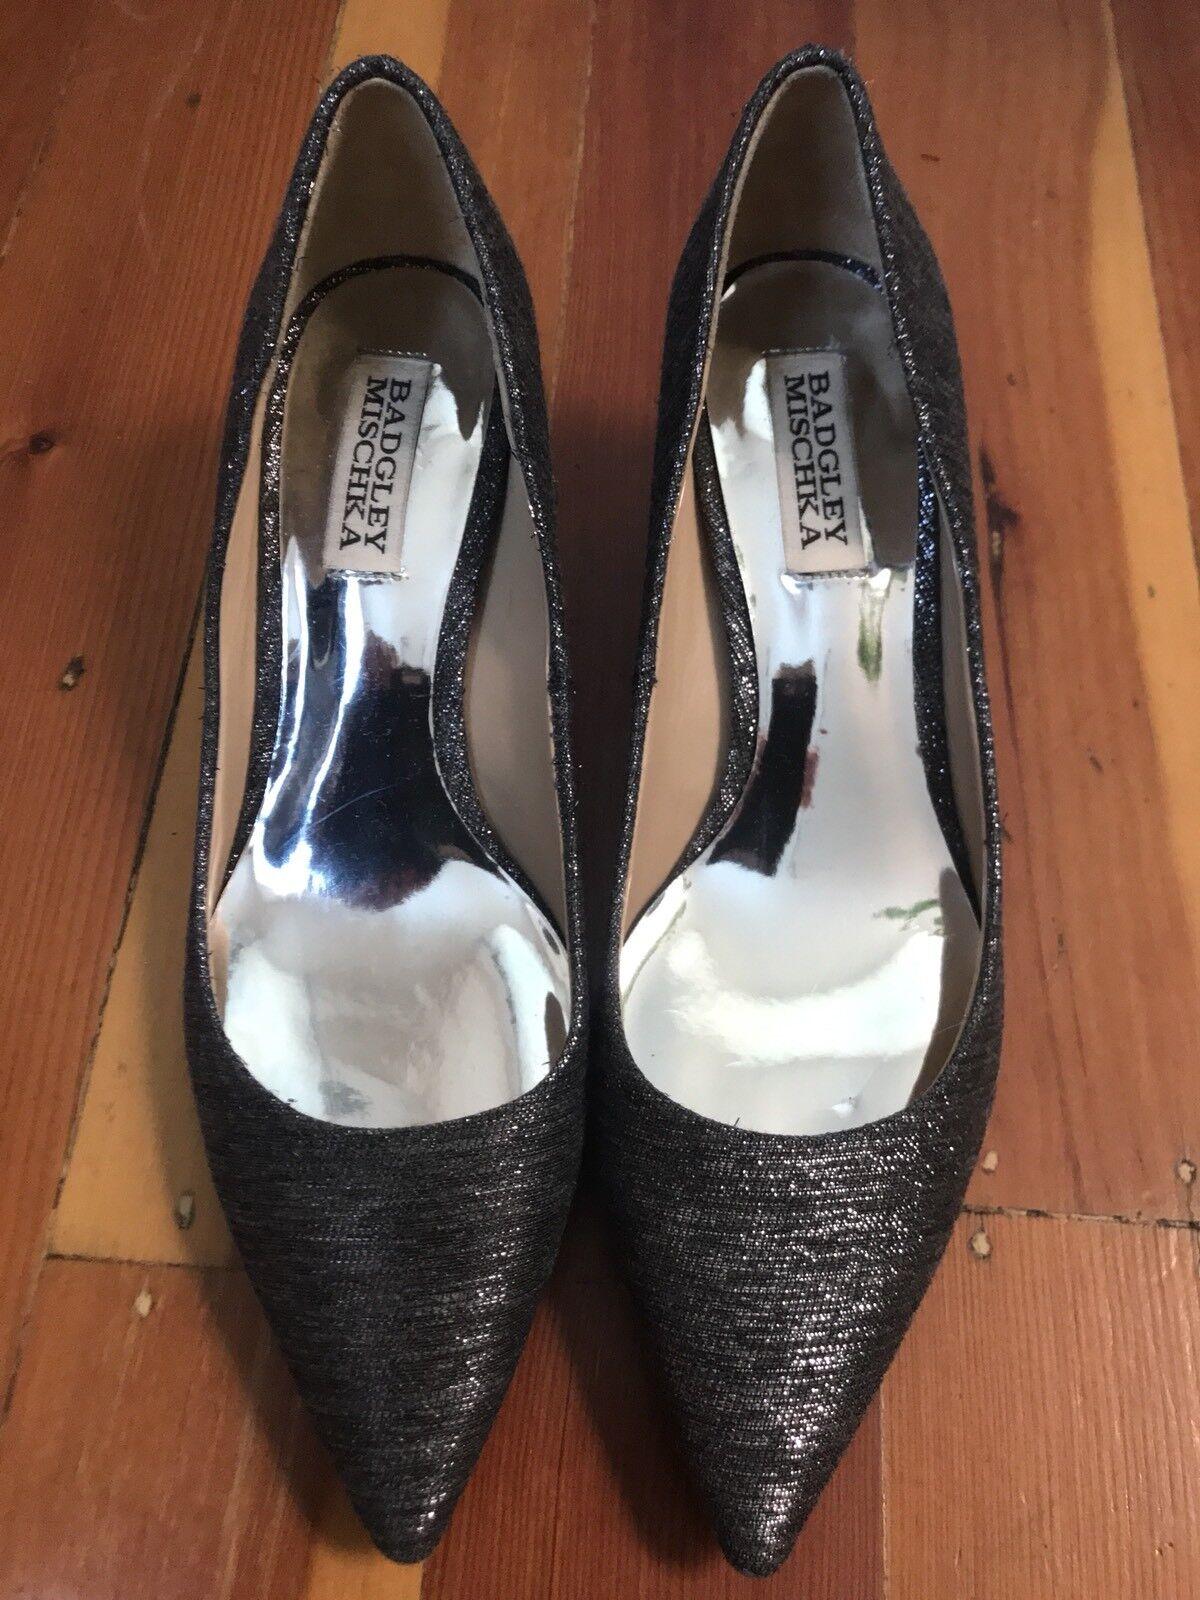 $245 badgley mischka gray jeweled metallic jeweled gray pointed kitten heels shoes Sz 7 983557